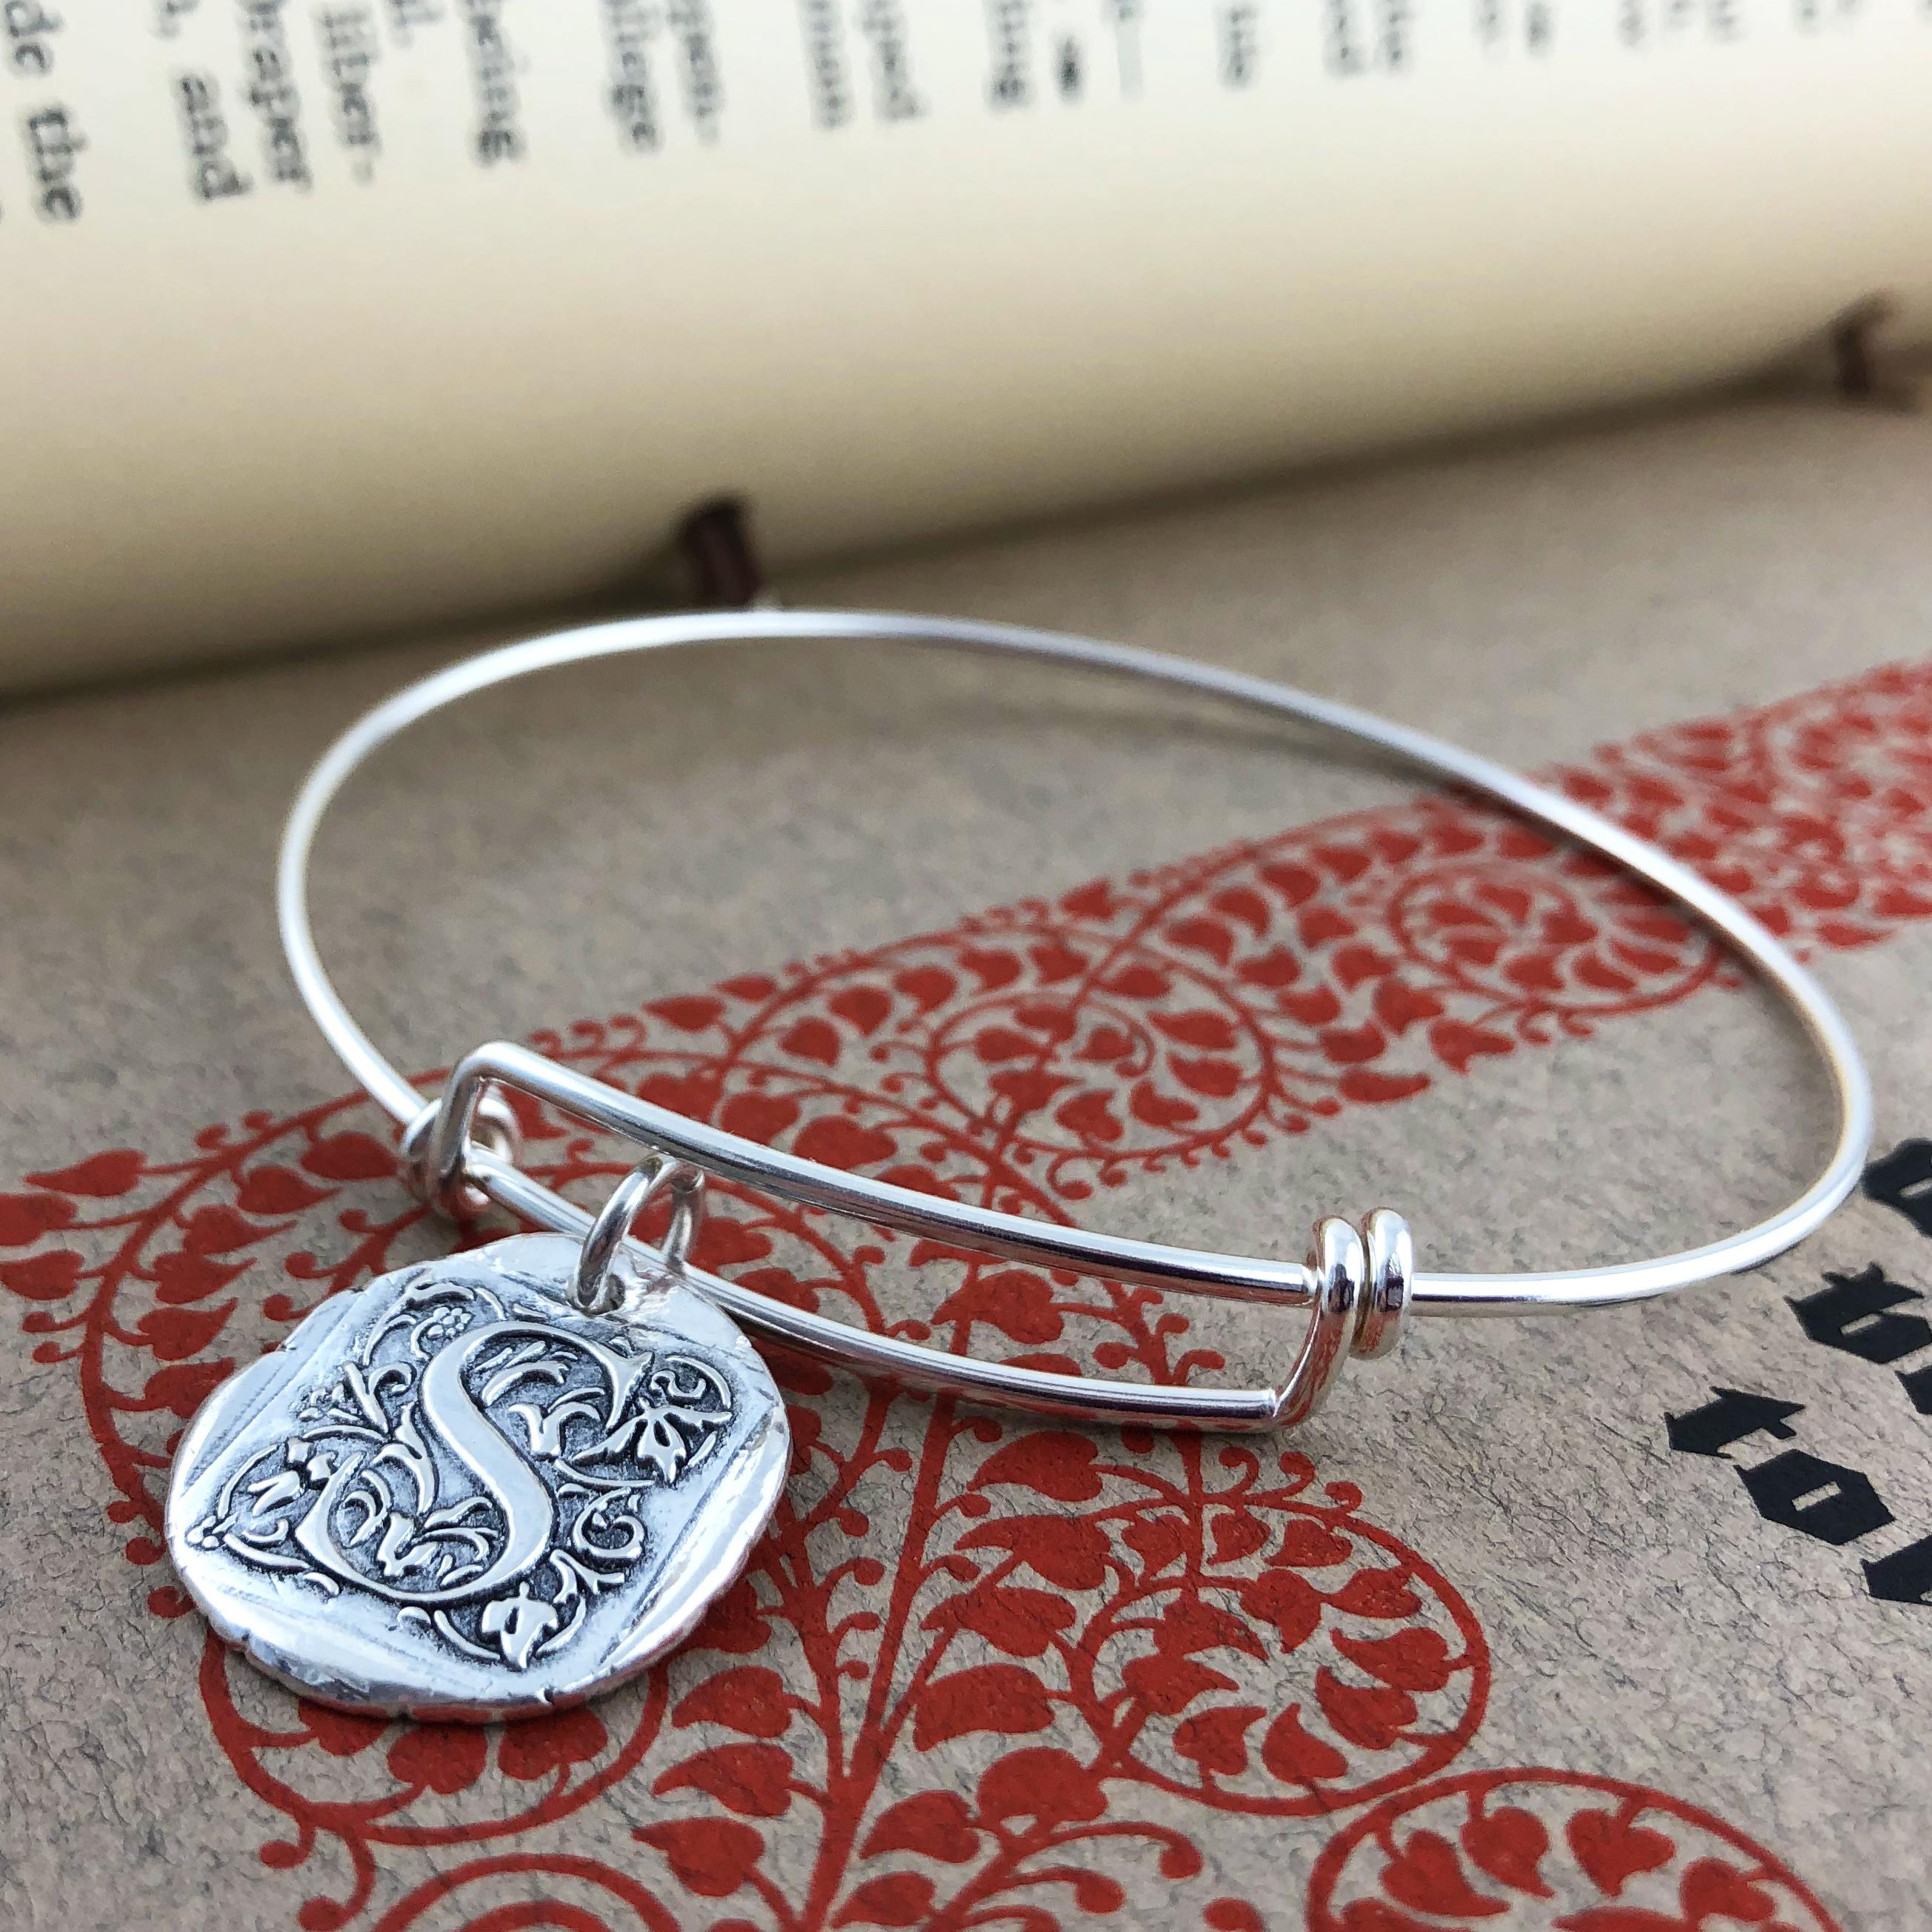 Initial Cap Wax Seal Inspired Bangle Bracelet